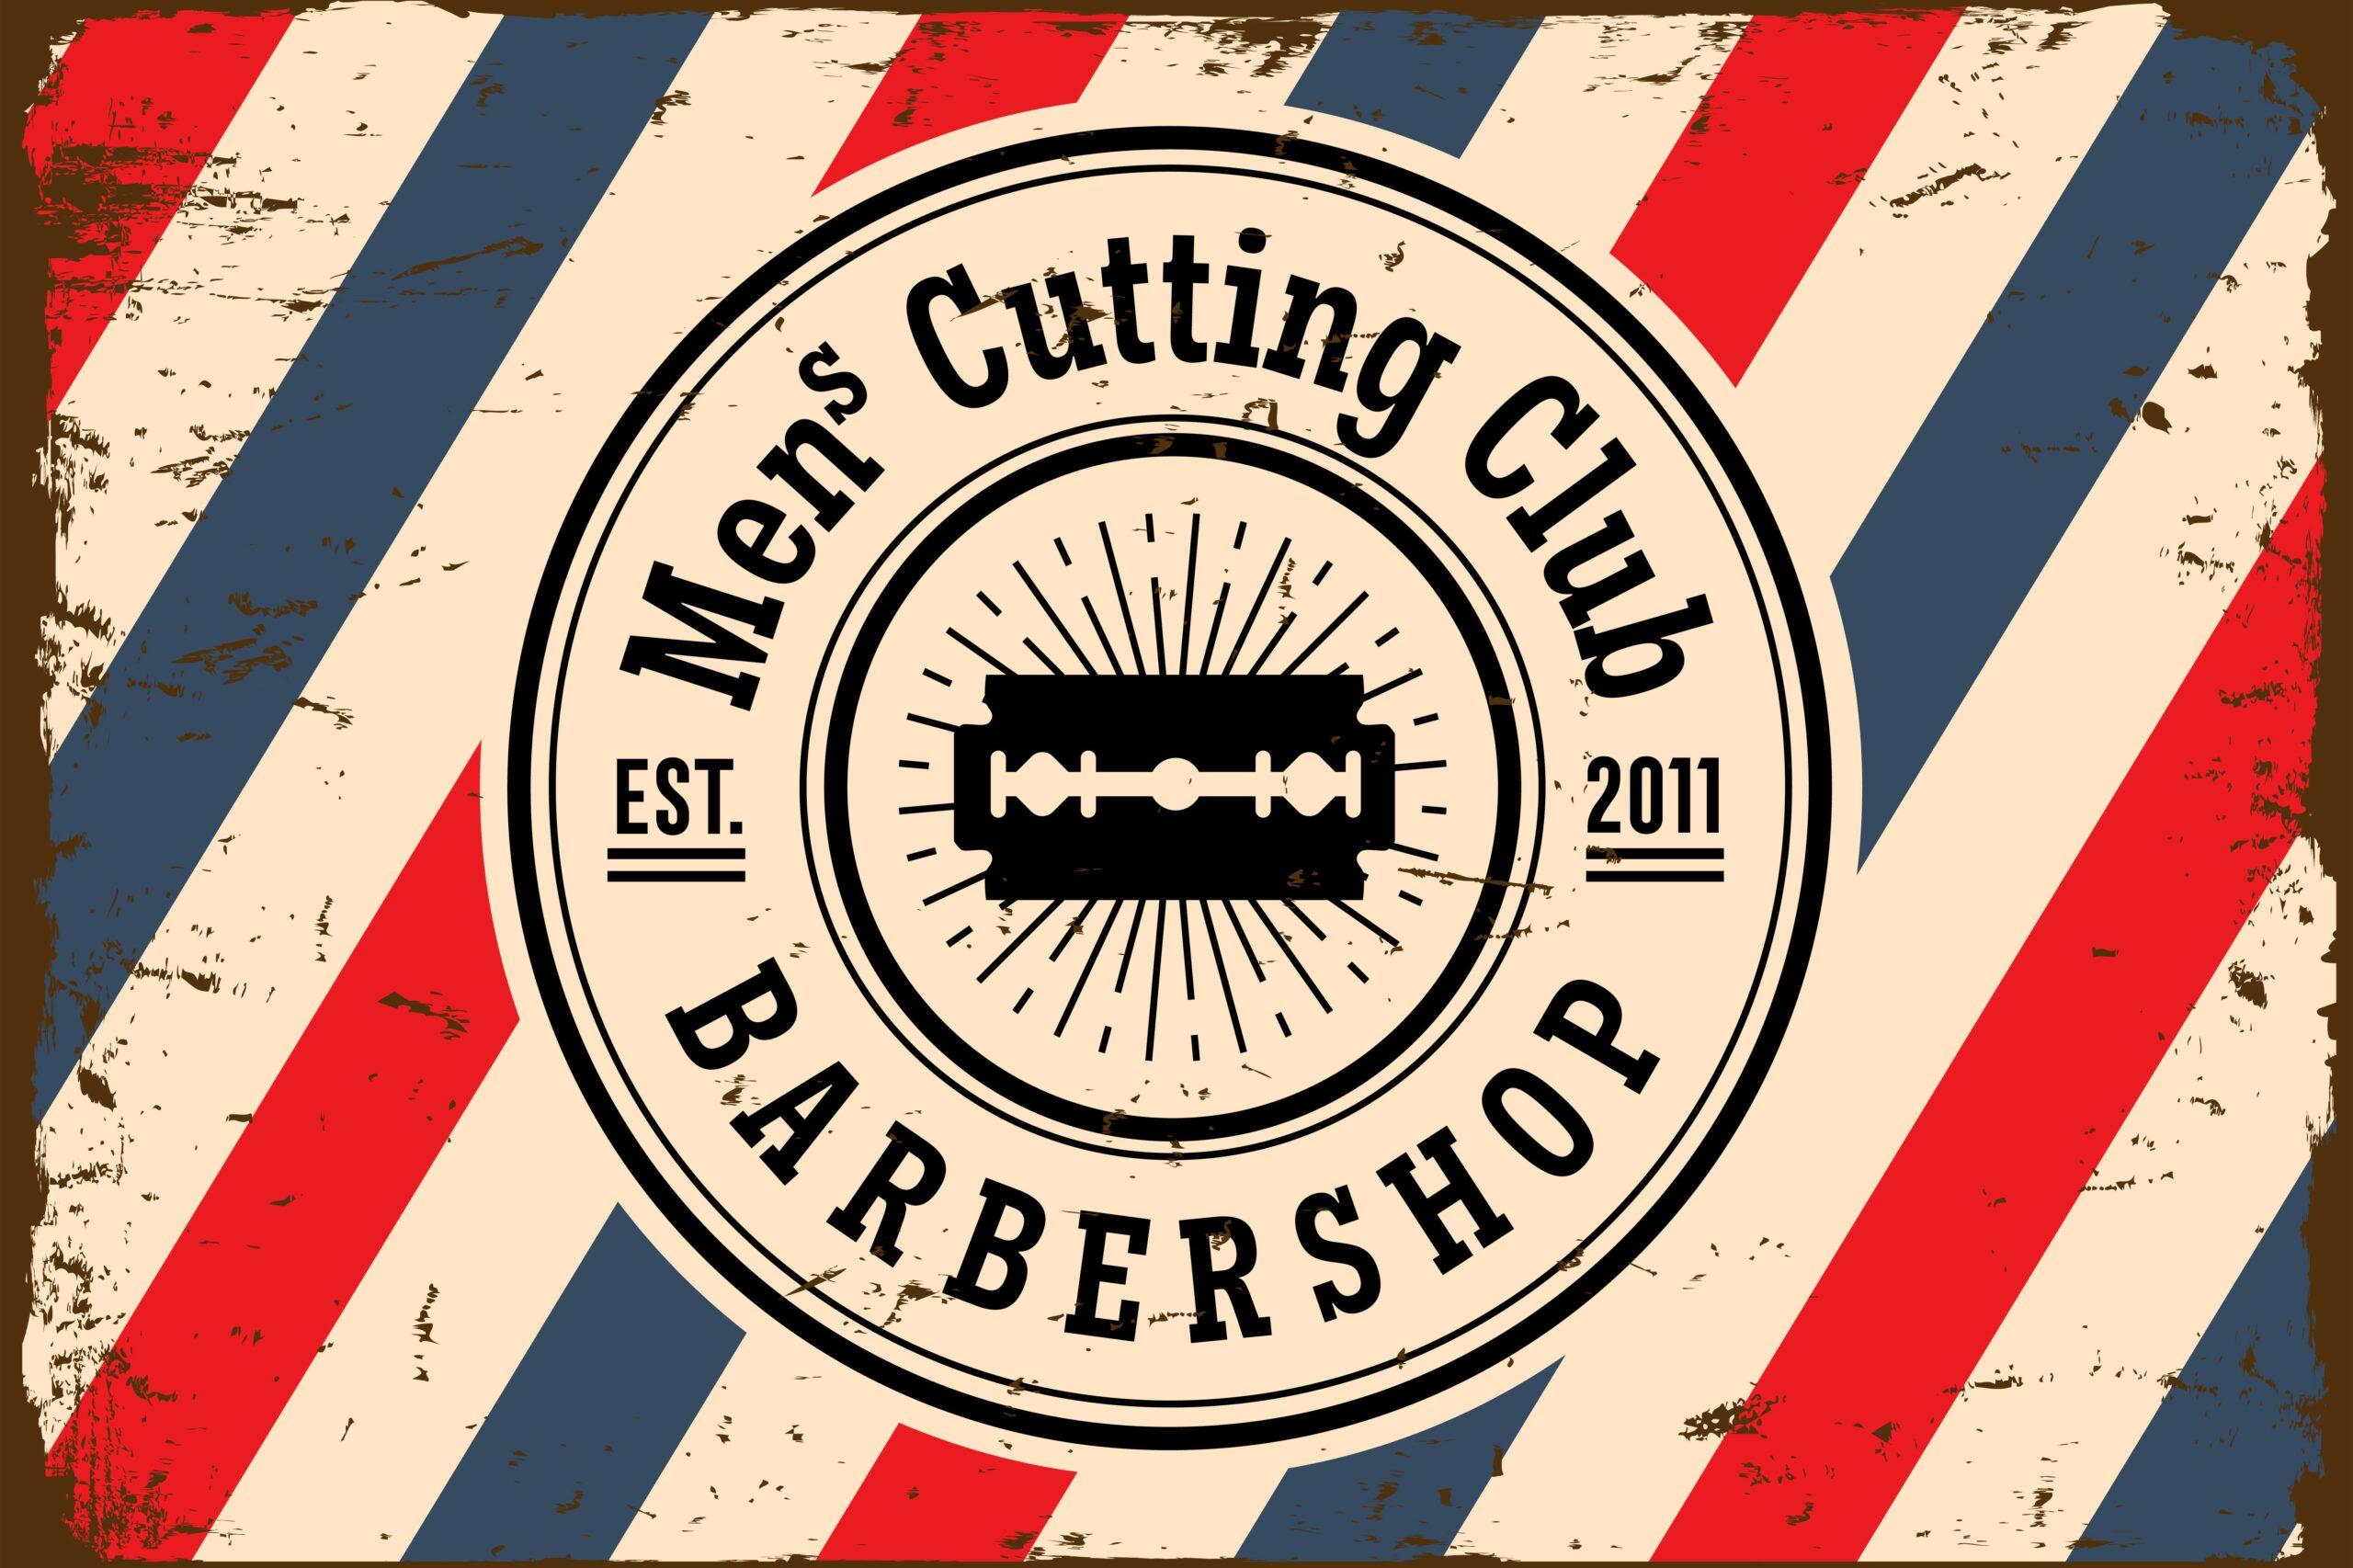 Menscuttingclub